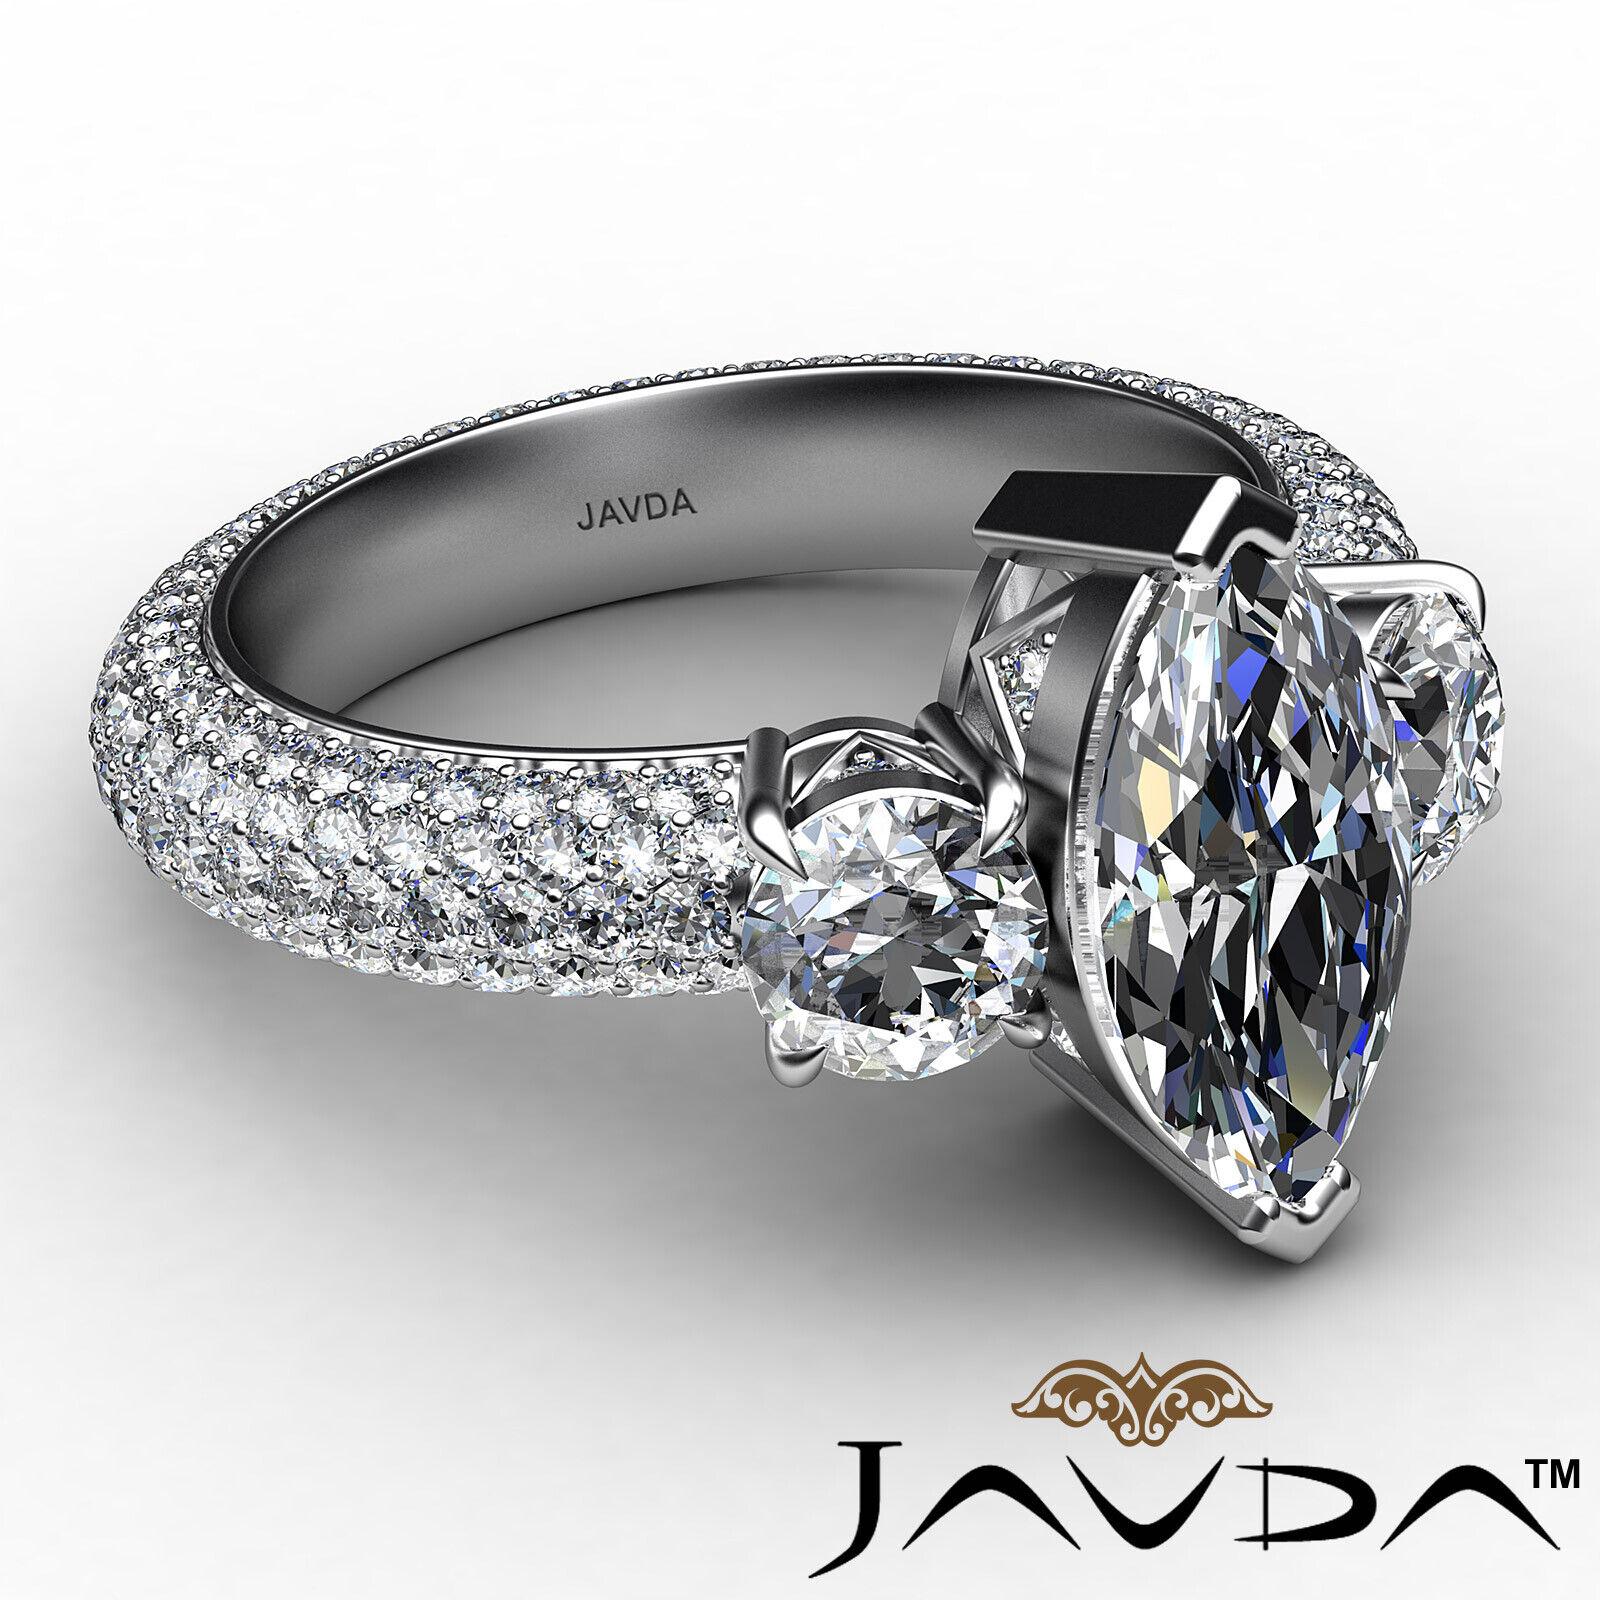 Marquise Diamond Engagement Pave Set Ring GIA K Color & VVS2 clarity 3.05 ctw 6